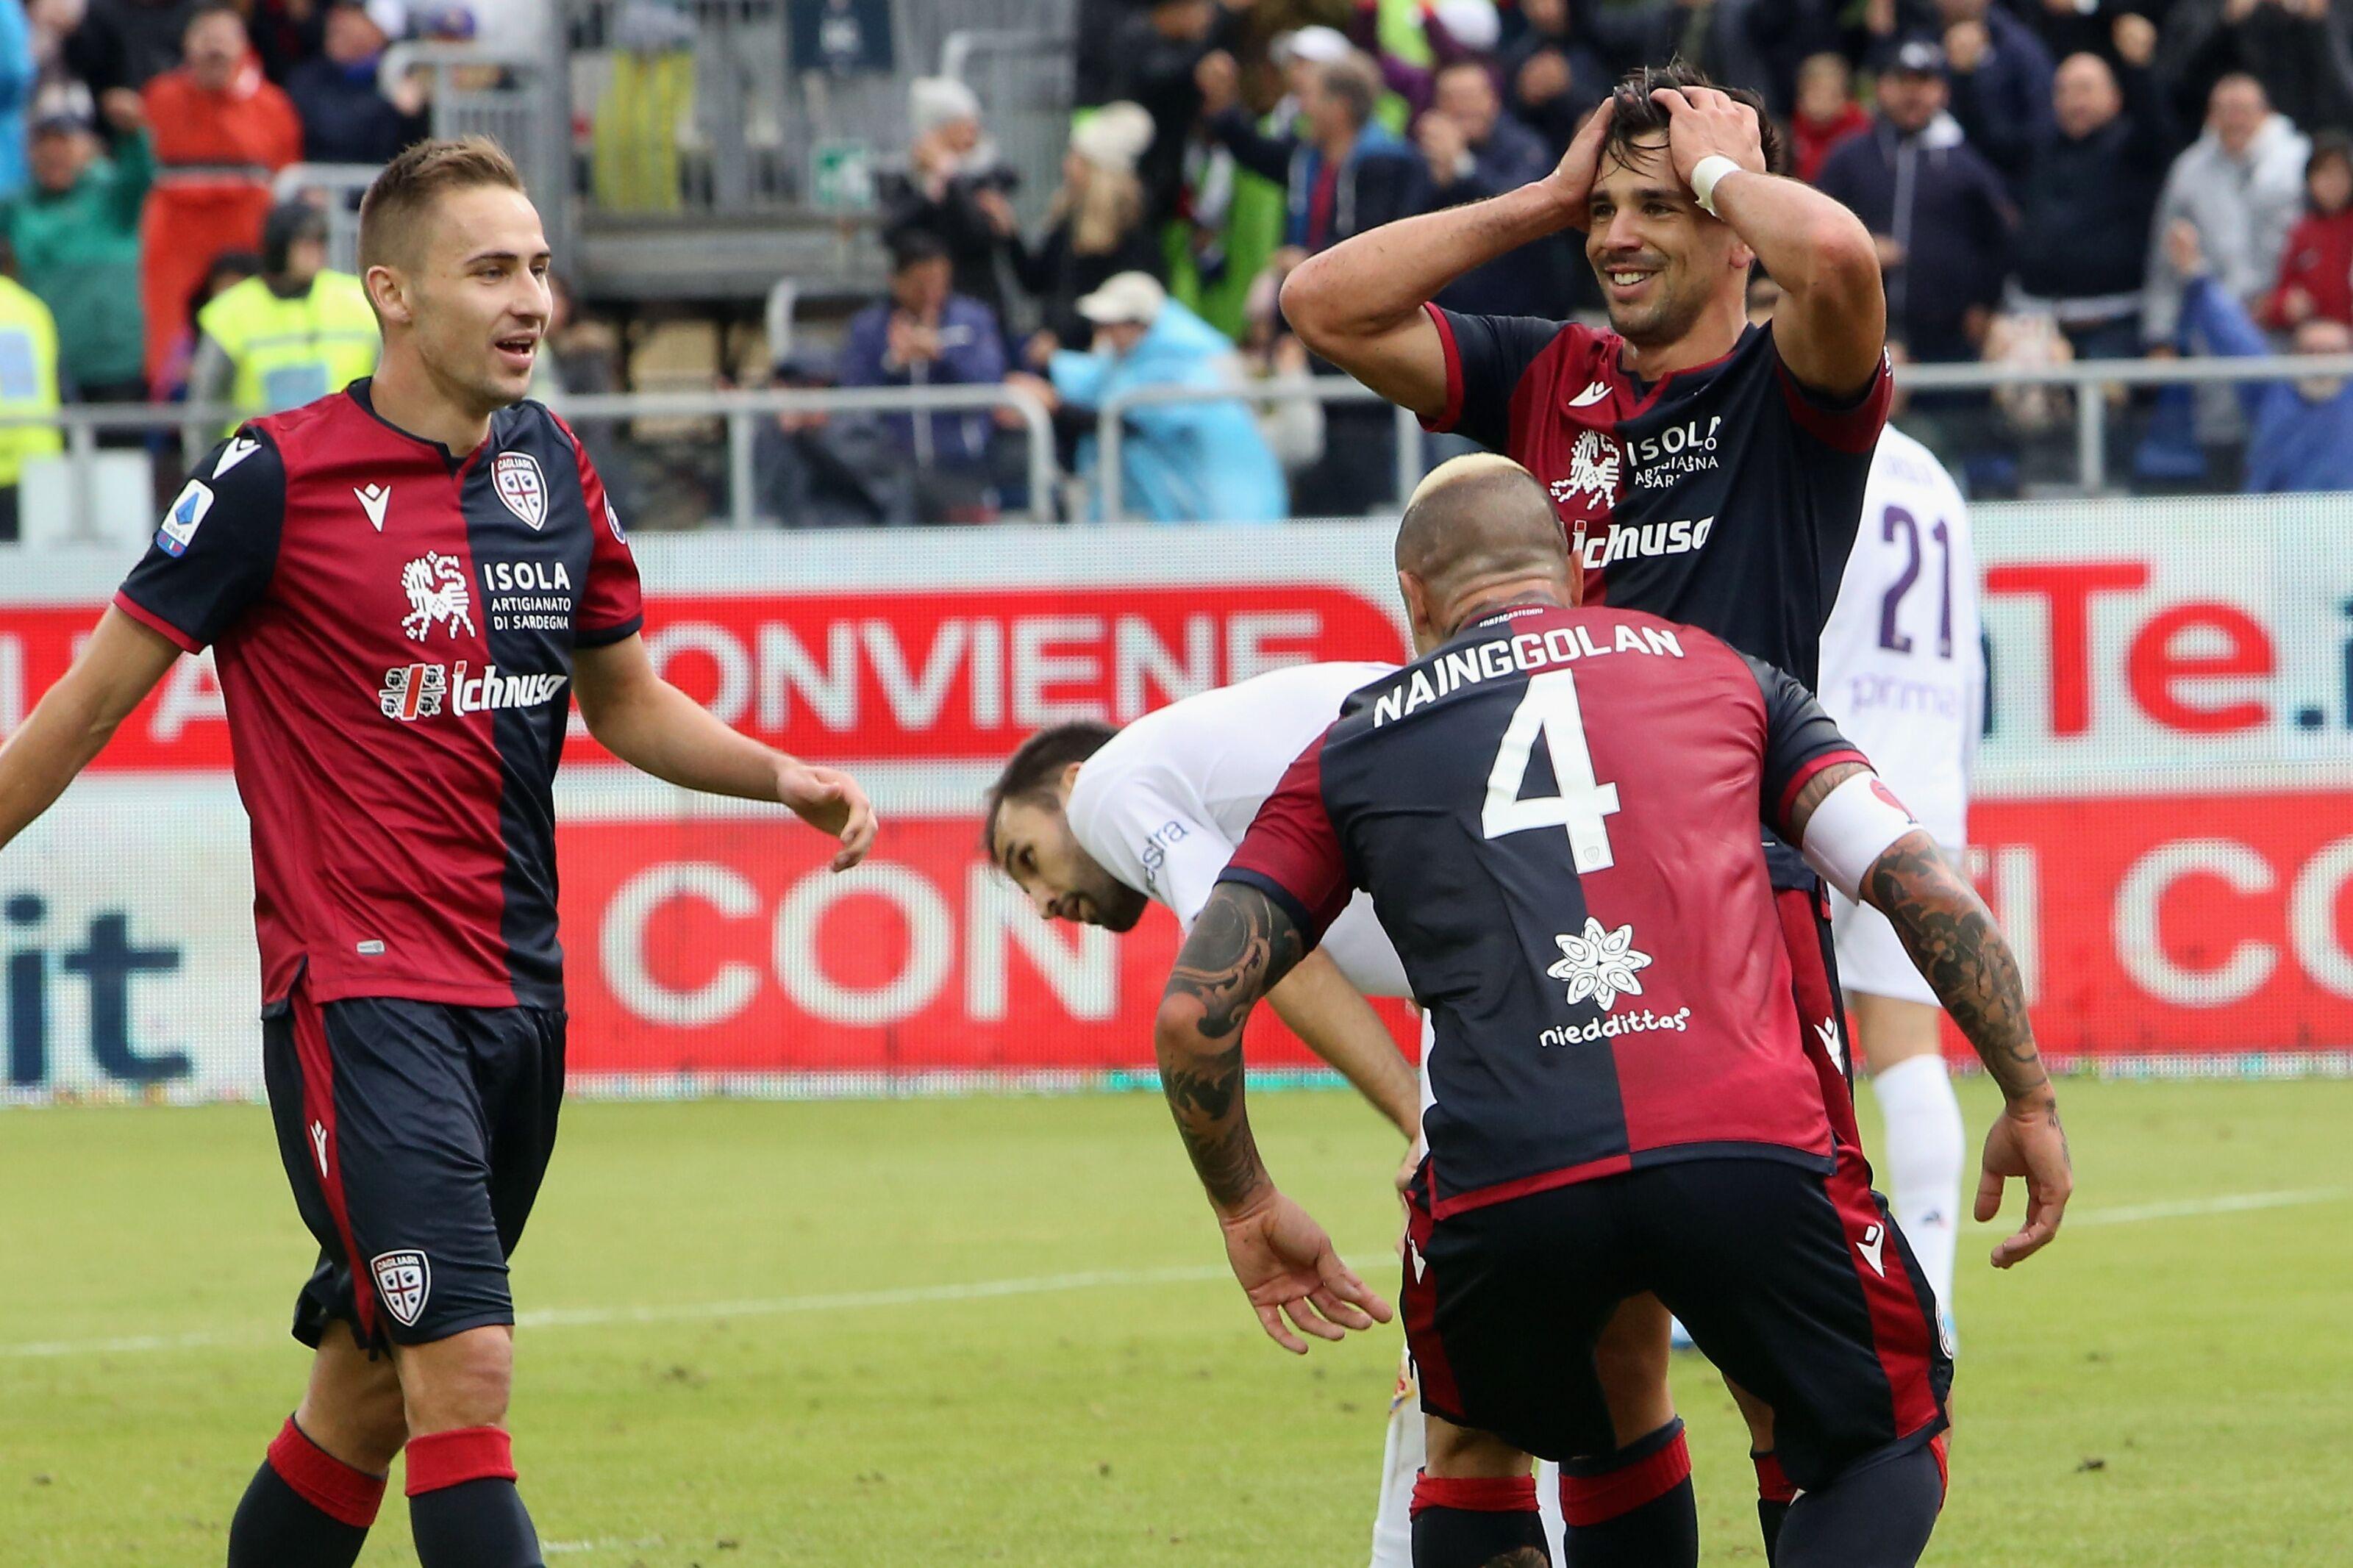 Cagliari's rise gives Serie A a new Cinderella team this season